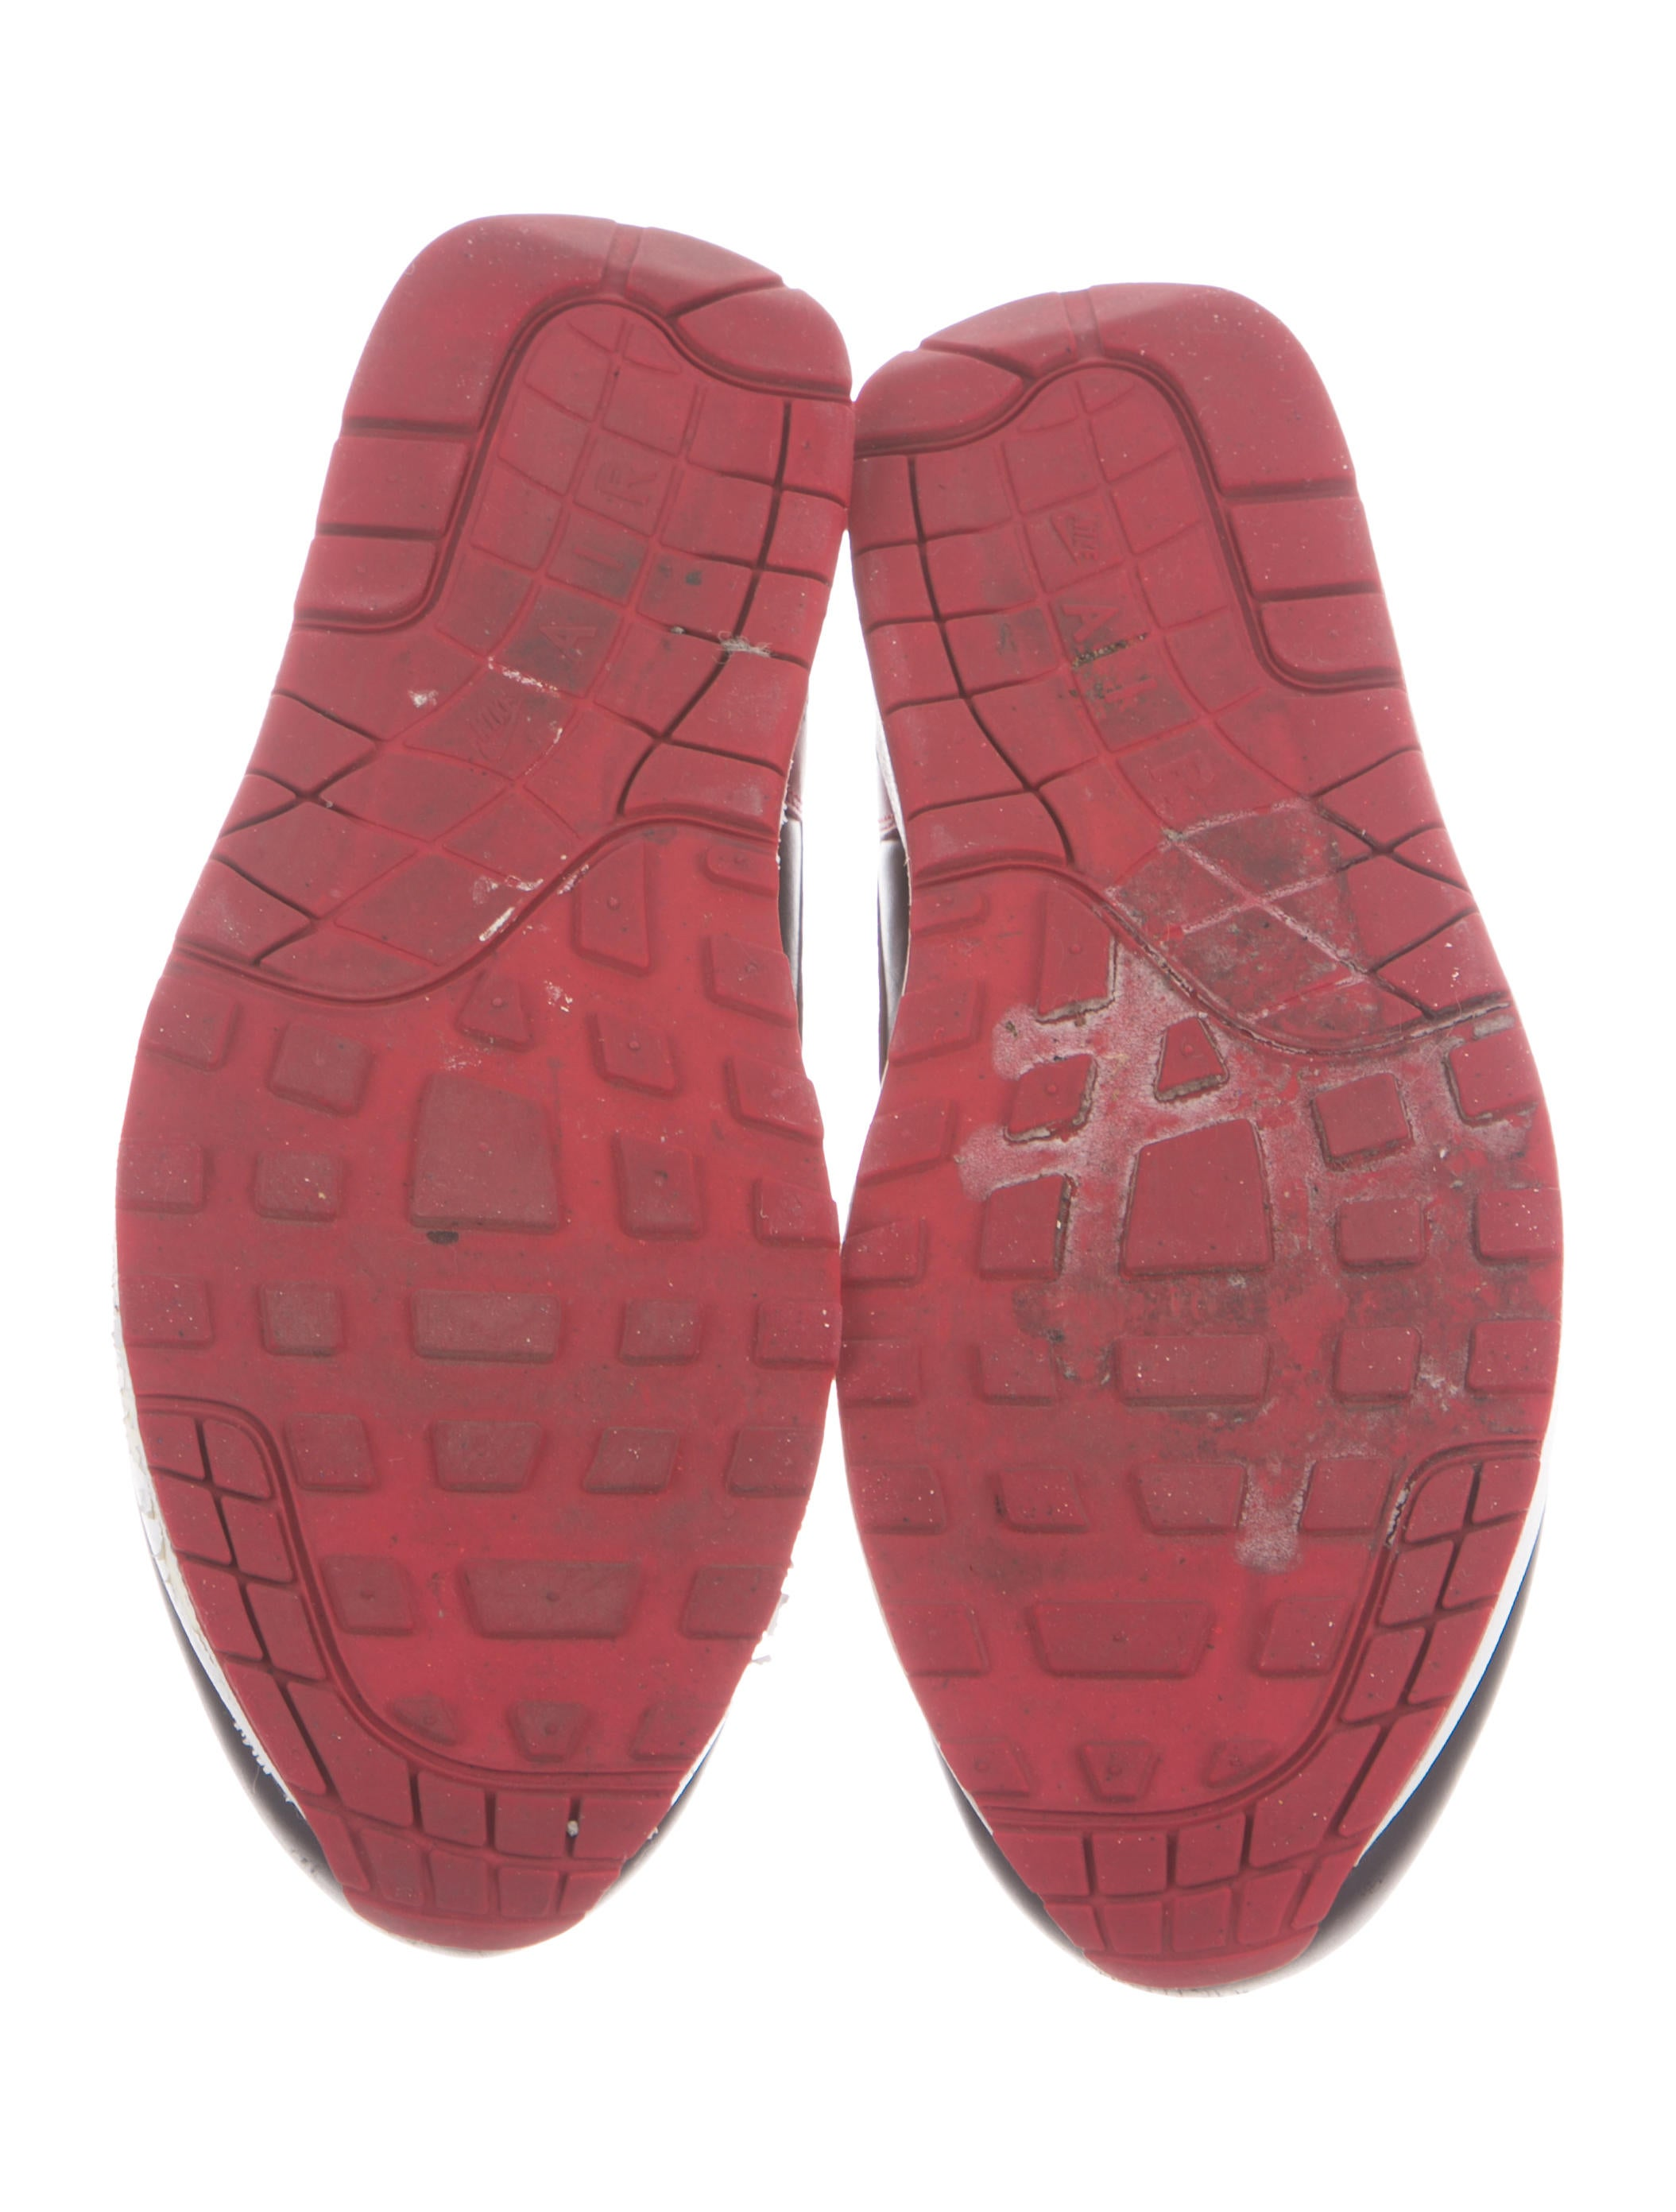 Nike Air Max 1 Premium QS Bred Sneakers Shoes WU223484